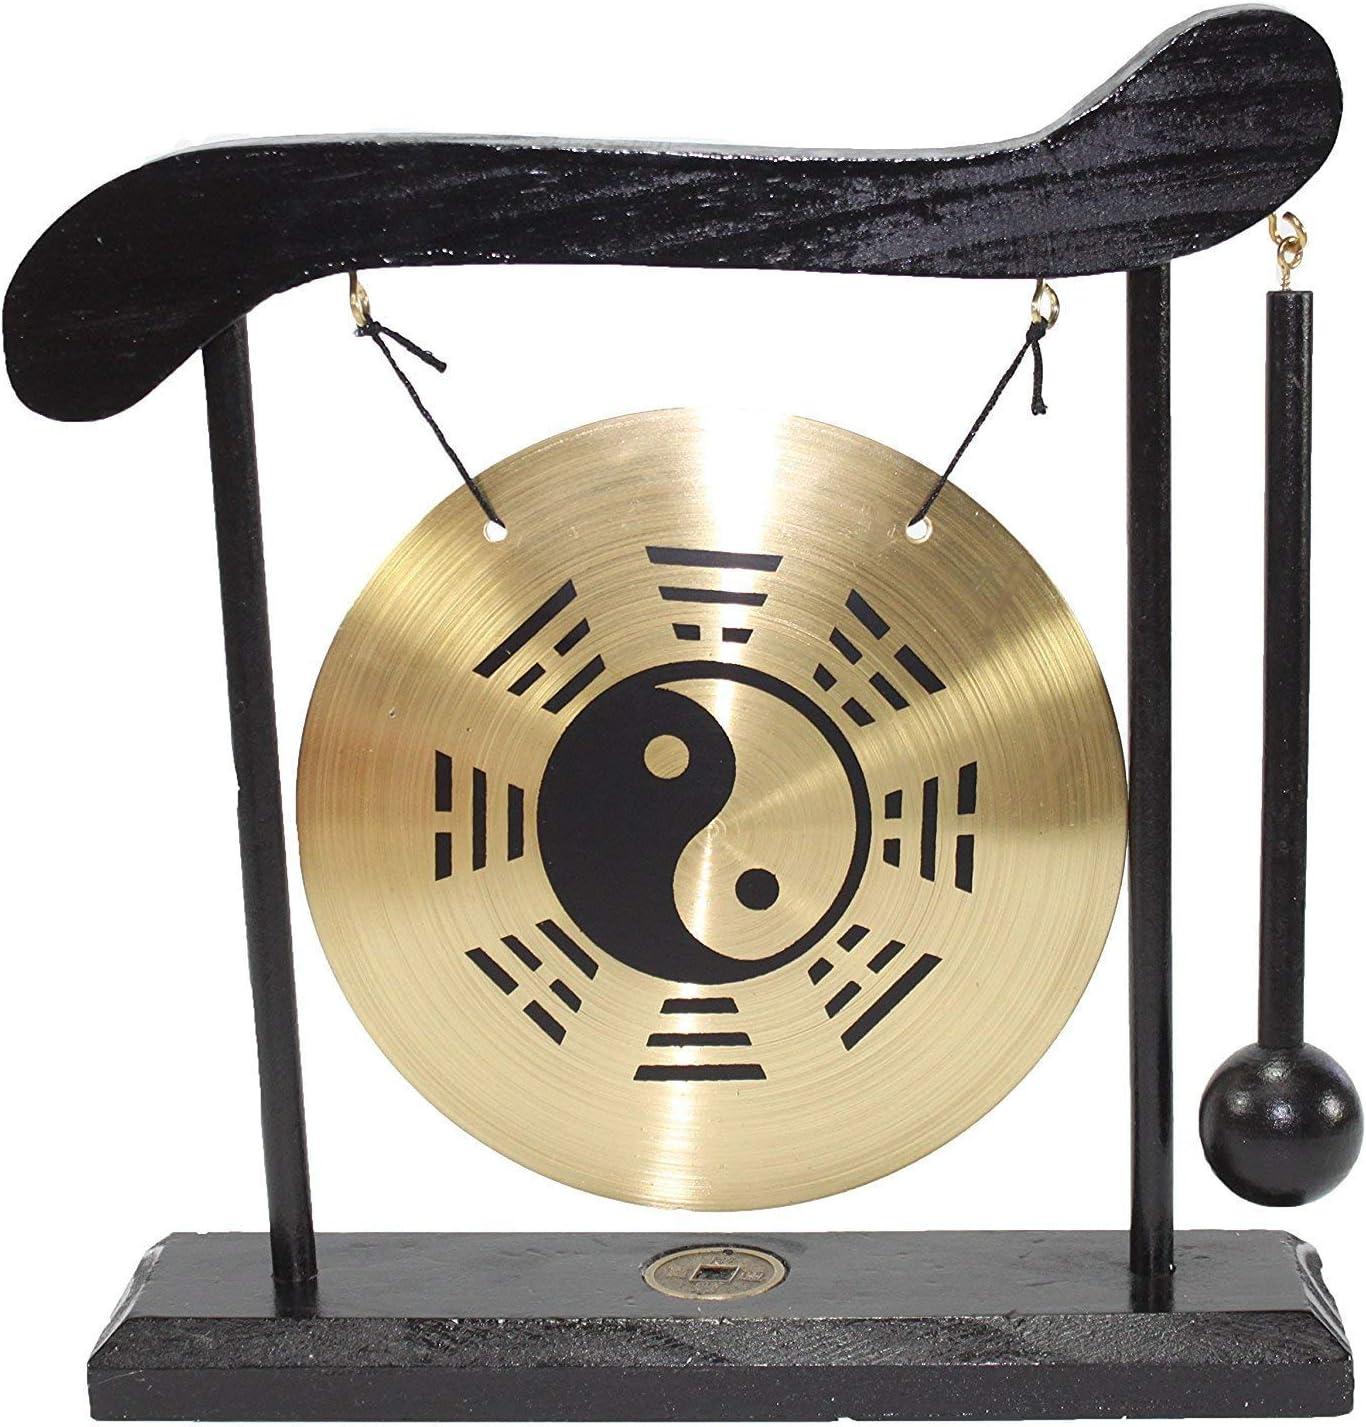 Zen Table Gong Taiji Symbol Feng Shui Meditation Desk Bell Home Decor Housewarming Congratulatory Blessing Gift